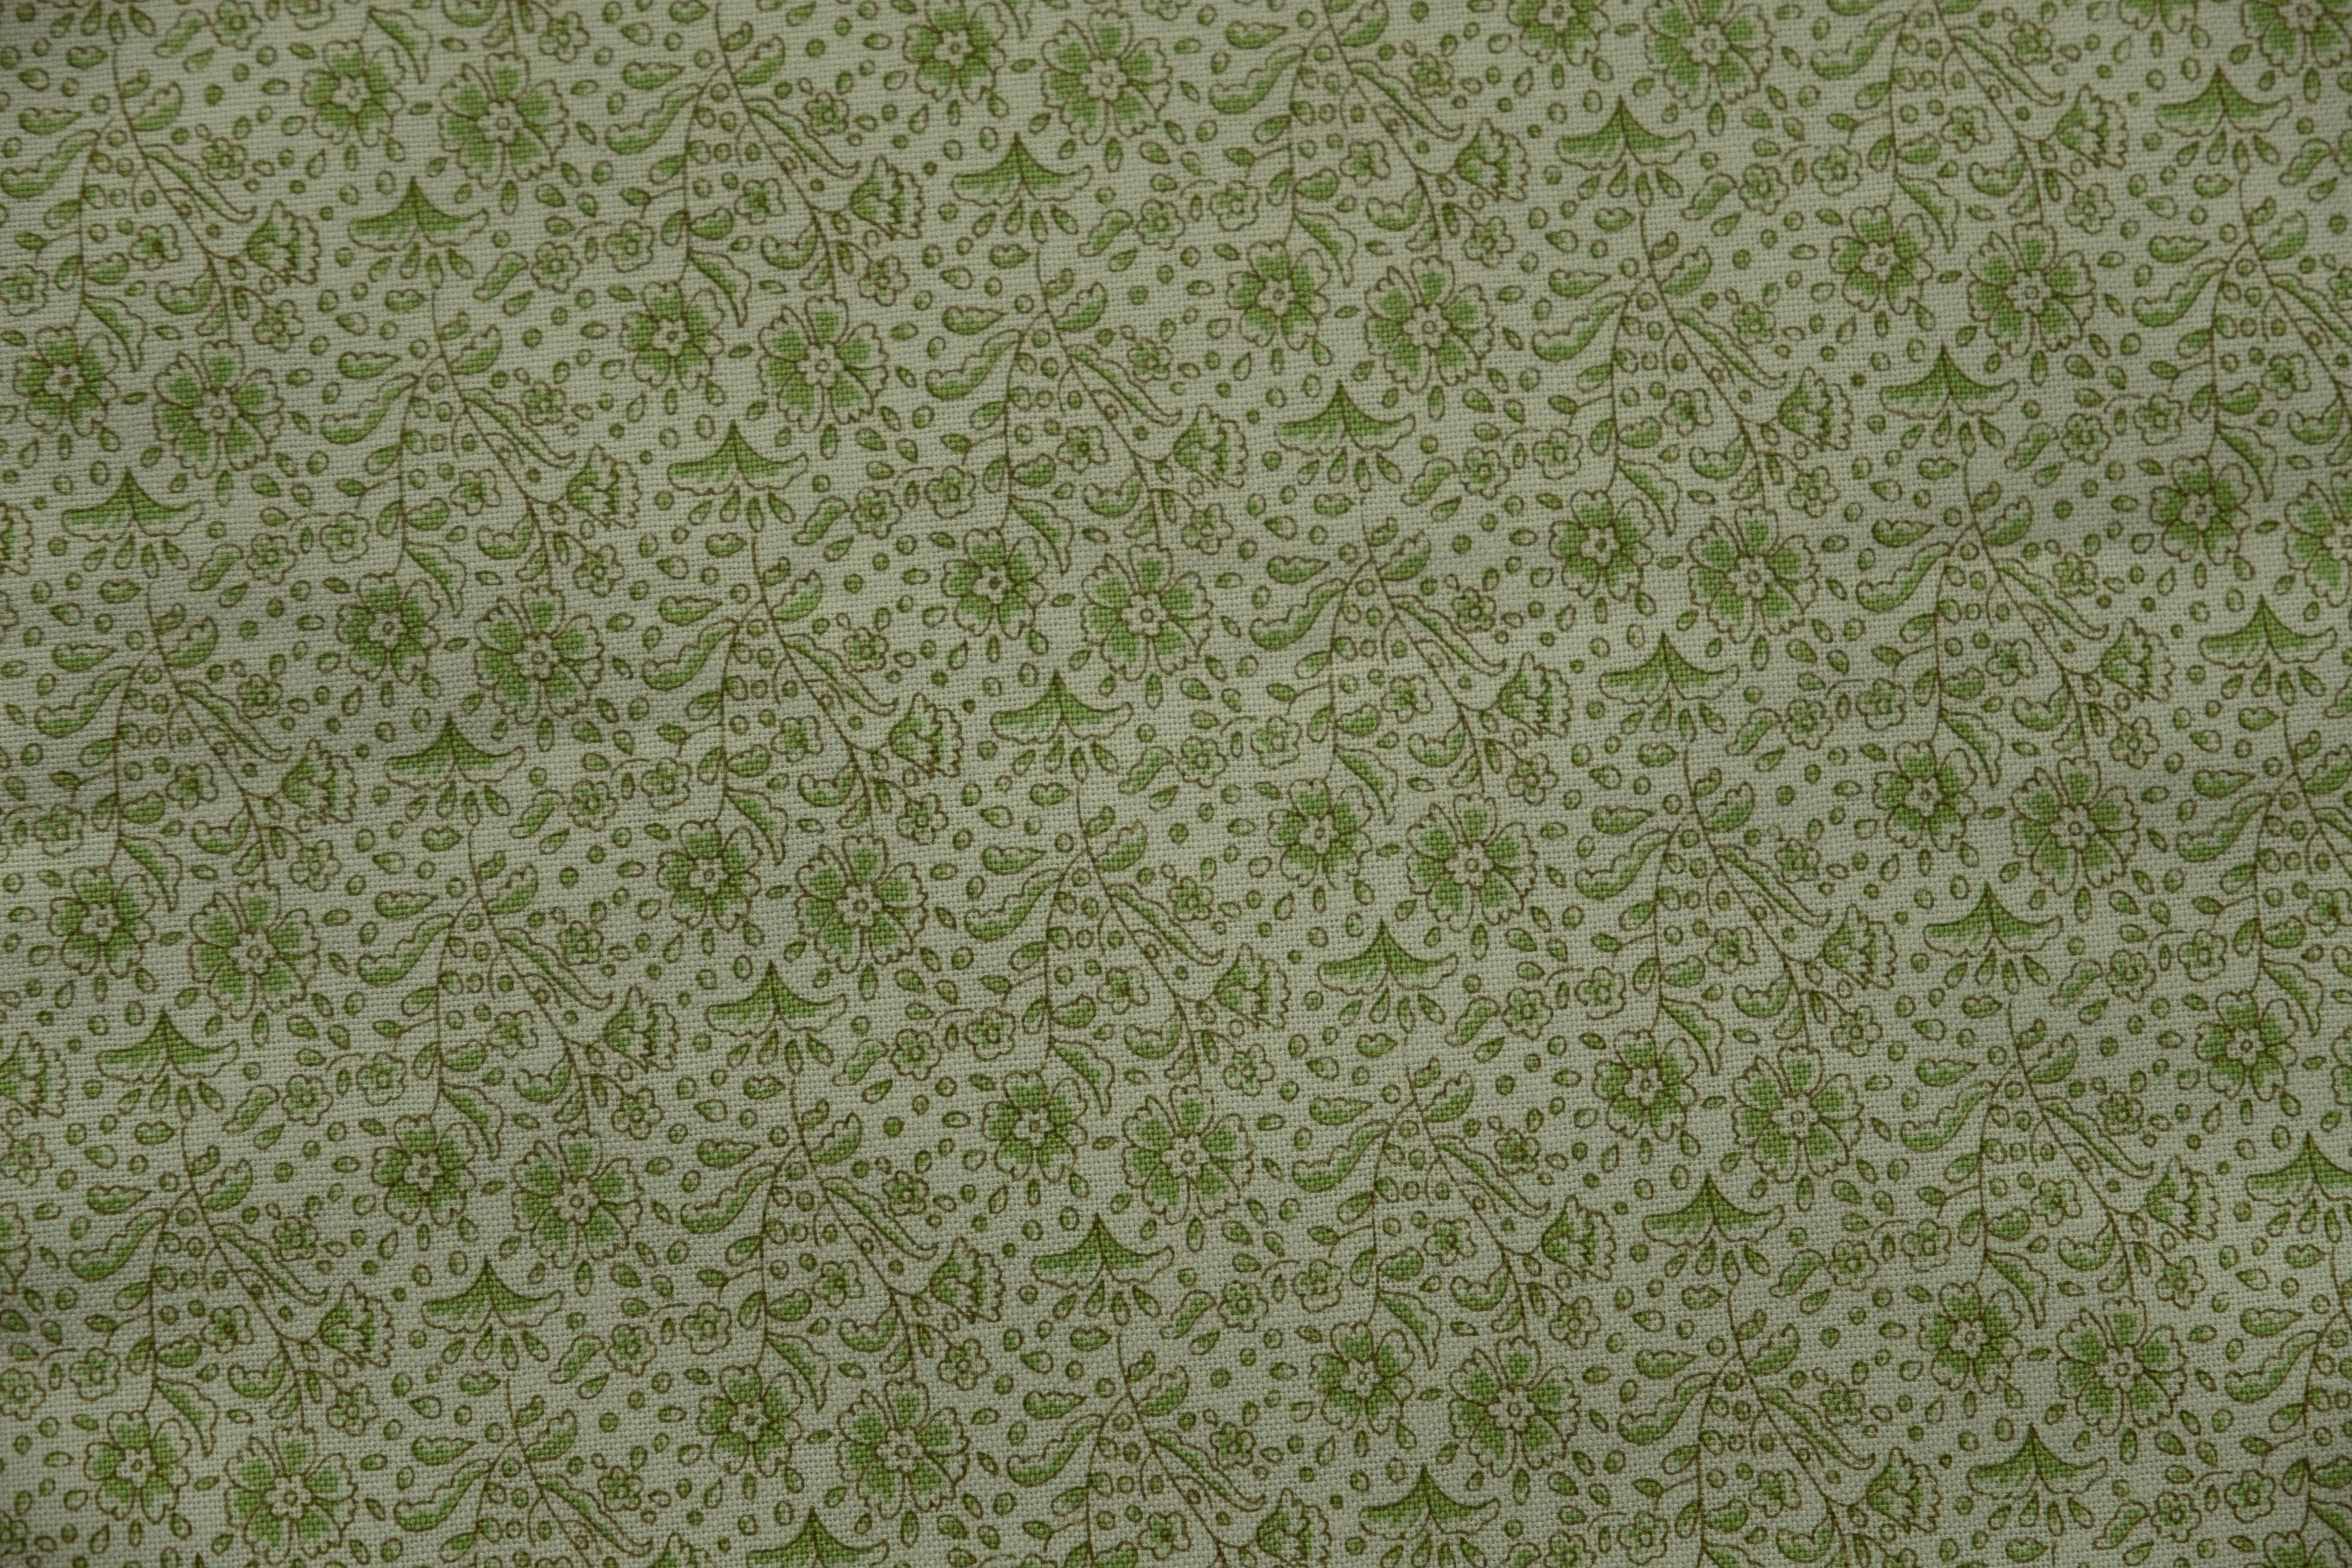 Fabric from Tilda, Bird Pond Collection, Mila Sage Green 100095 - 1 yd. cut